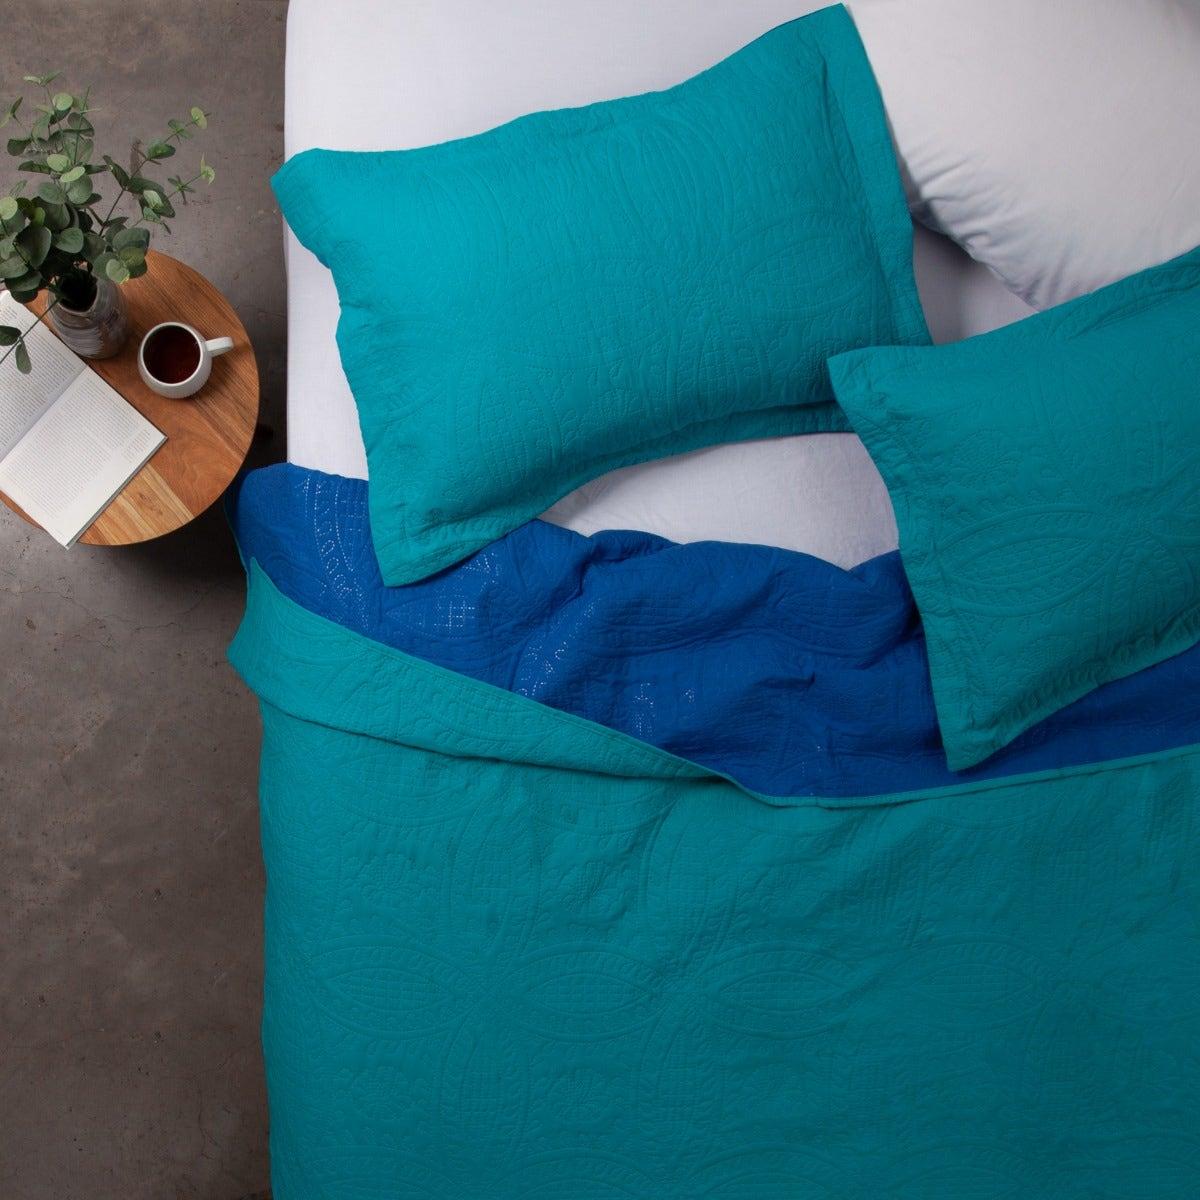 Quilt   2 Plazas Bicolor Turquesa Azul